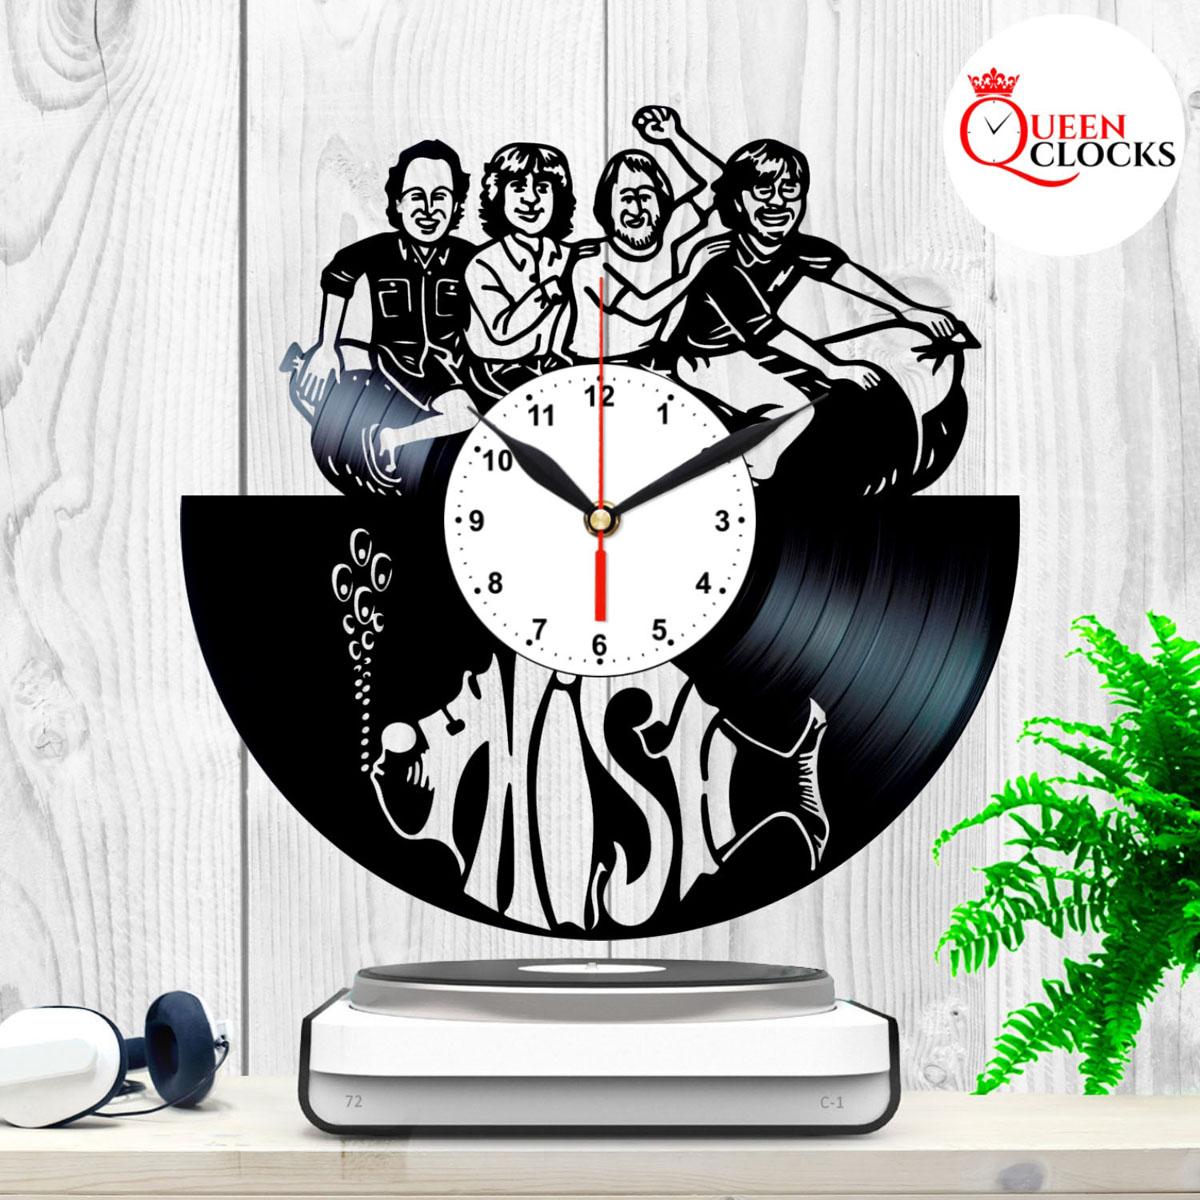 DEL Zeppelin Rock Vinyl Record Luang por Horloge murale Décor Art Decor Anniversaire Idée Cadeau